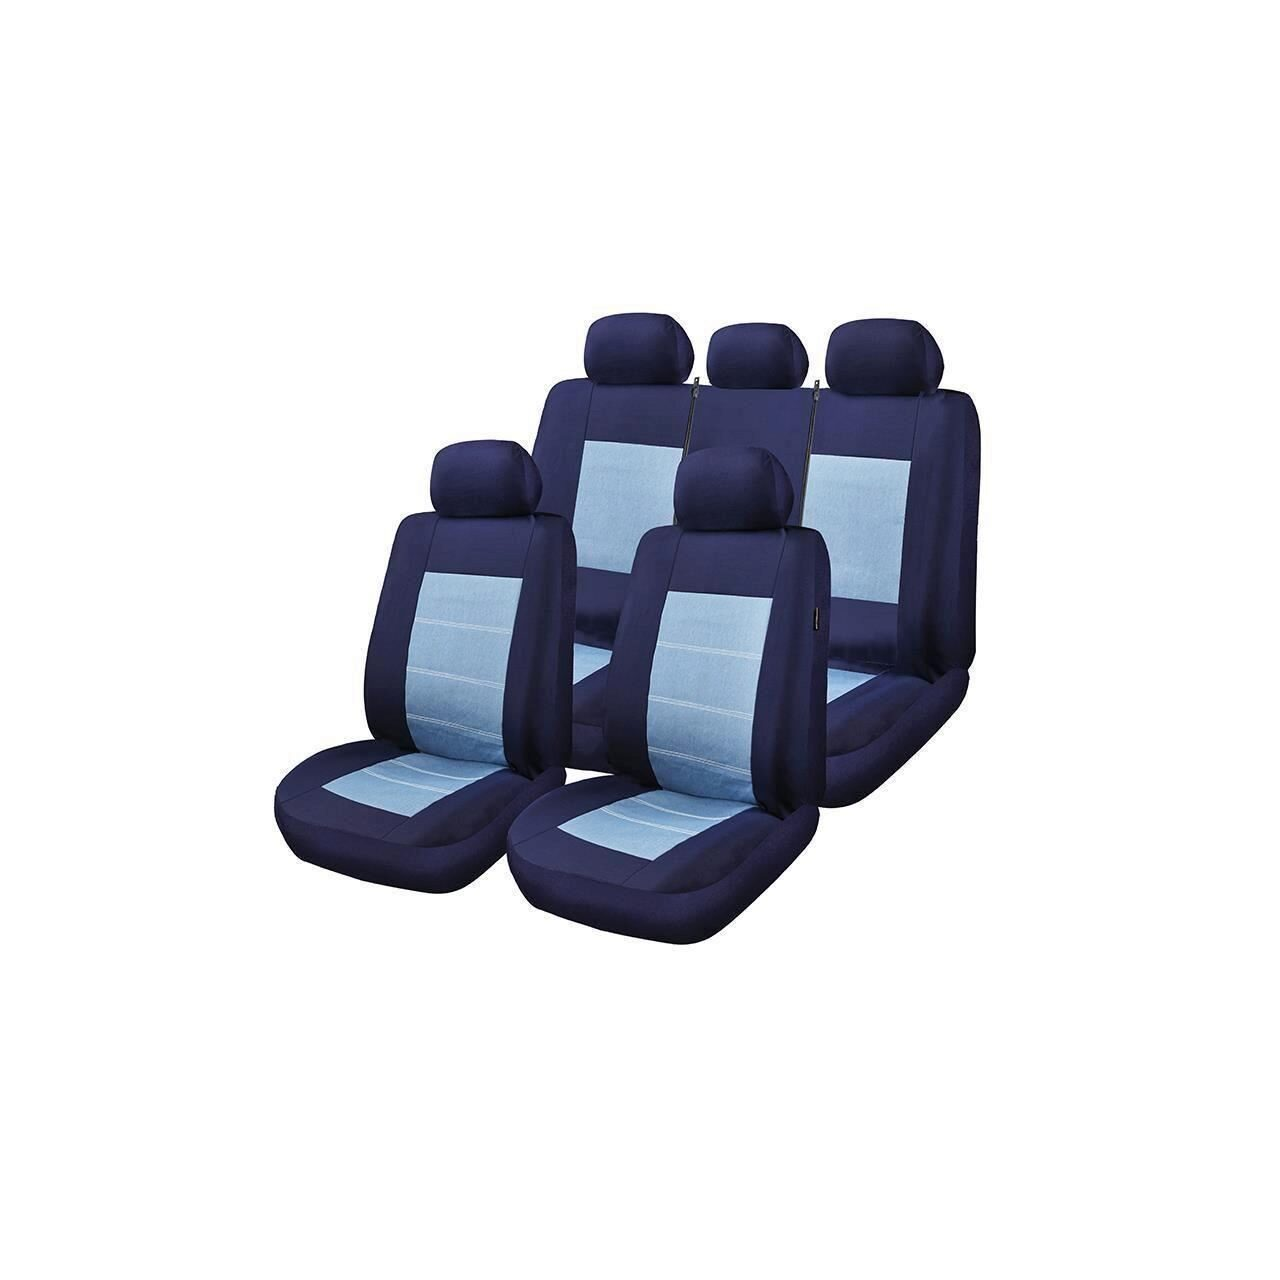 Huse Scaune Auto Blue Jeans Rogroup  9 Buc Hyundai